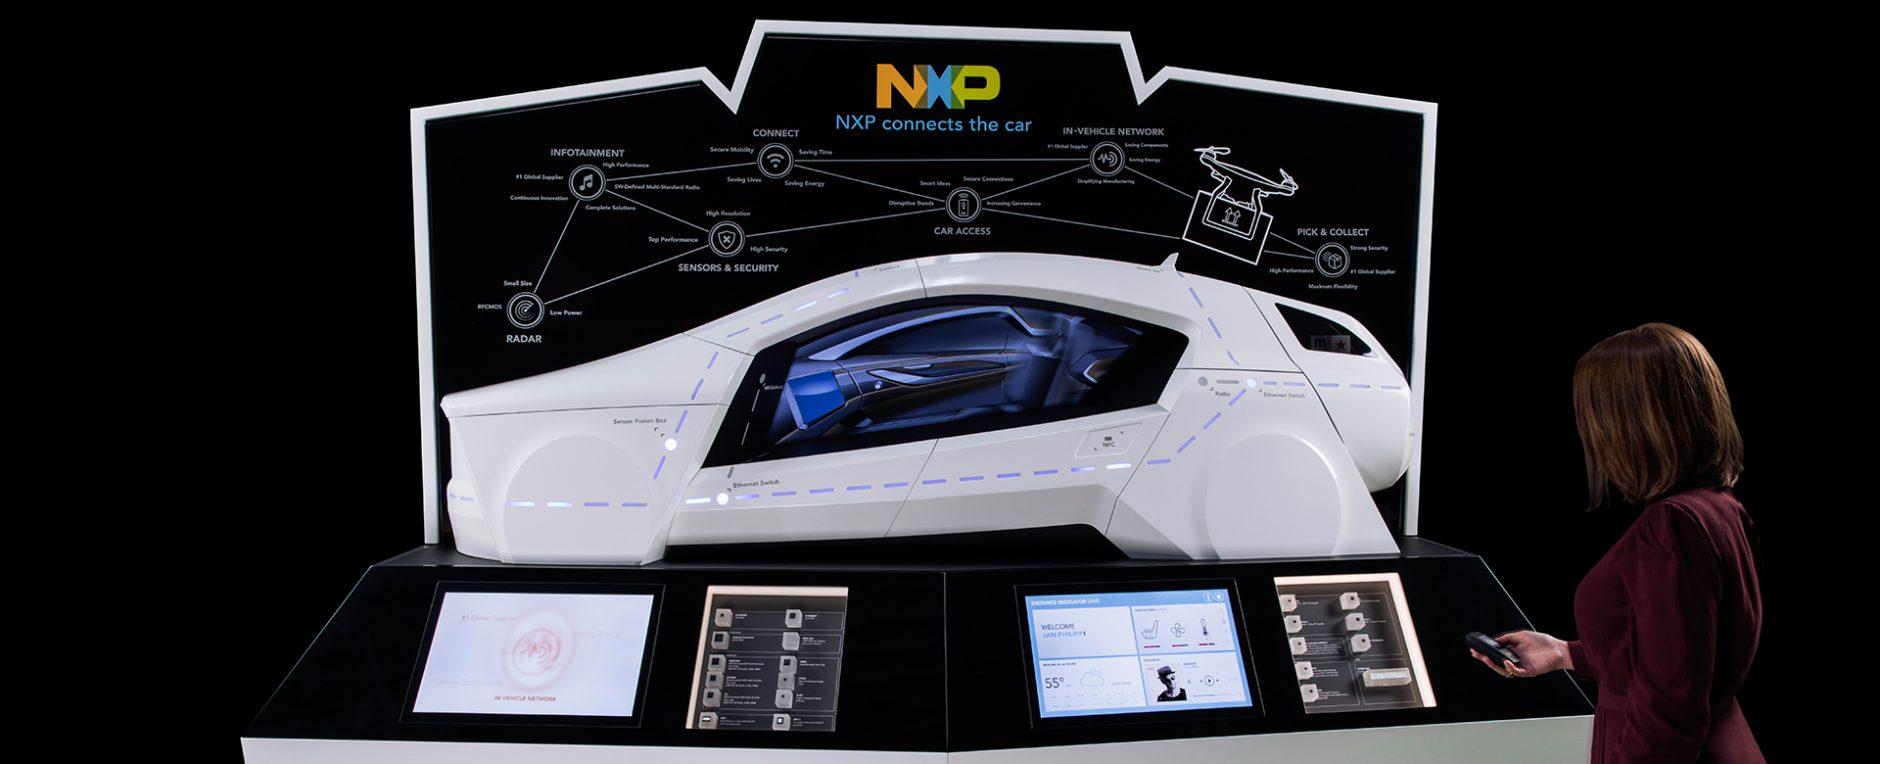 nxp_automotivedemo_caraccess_uwb2